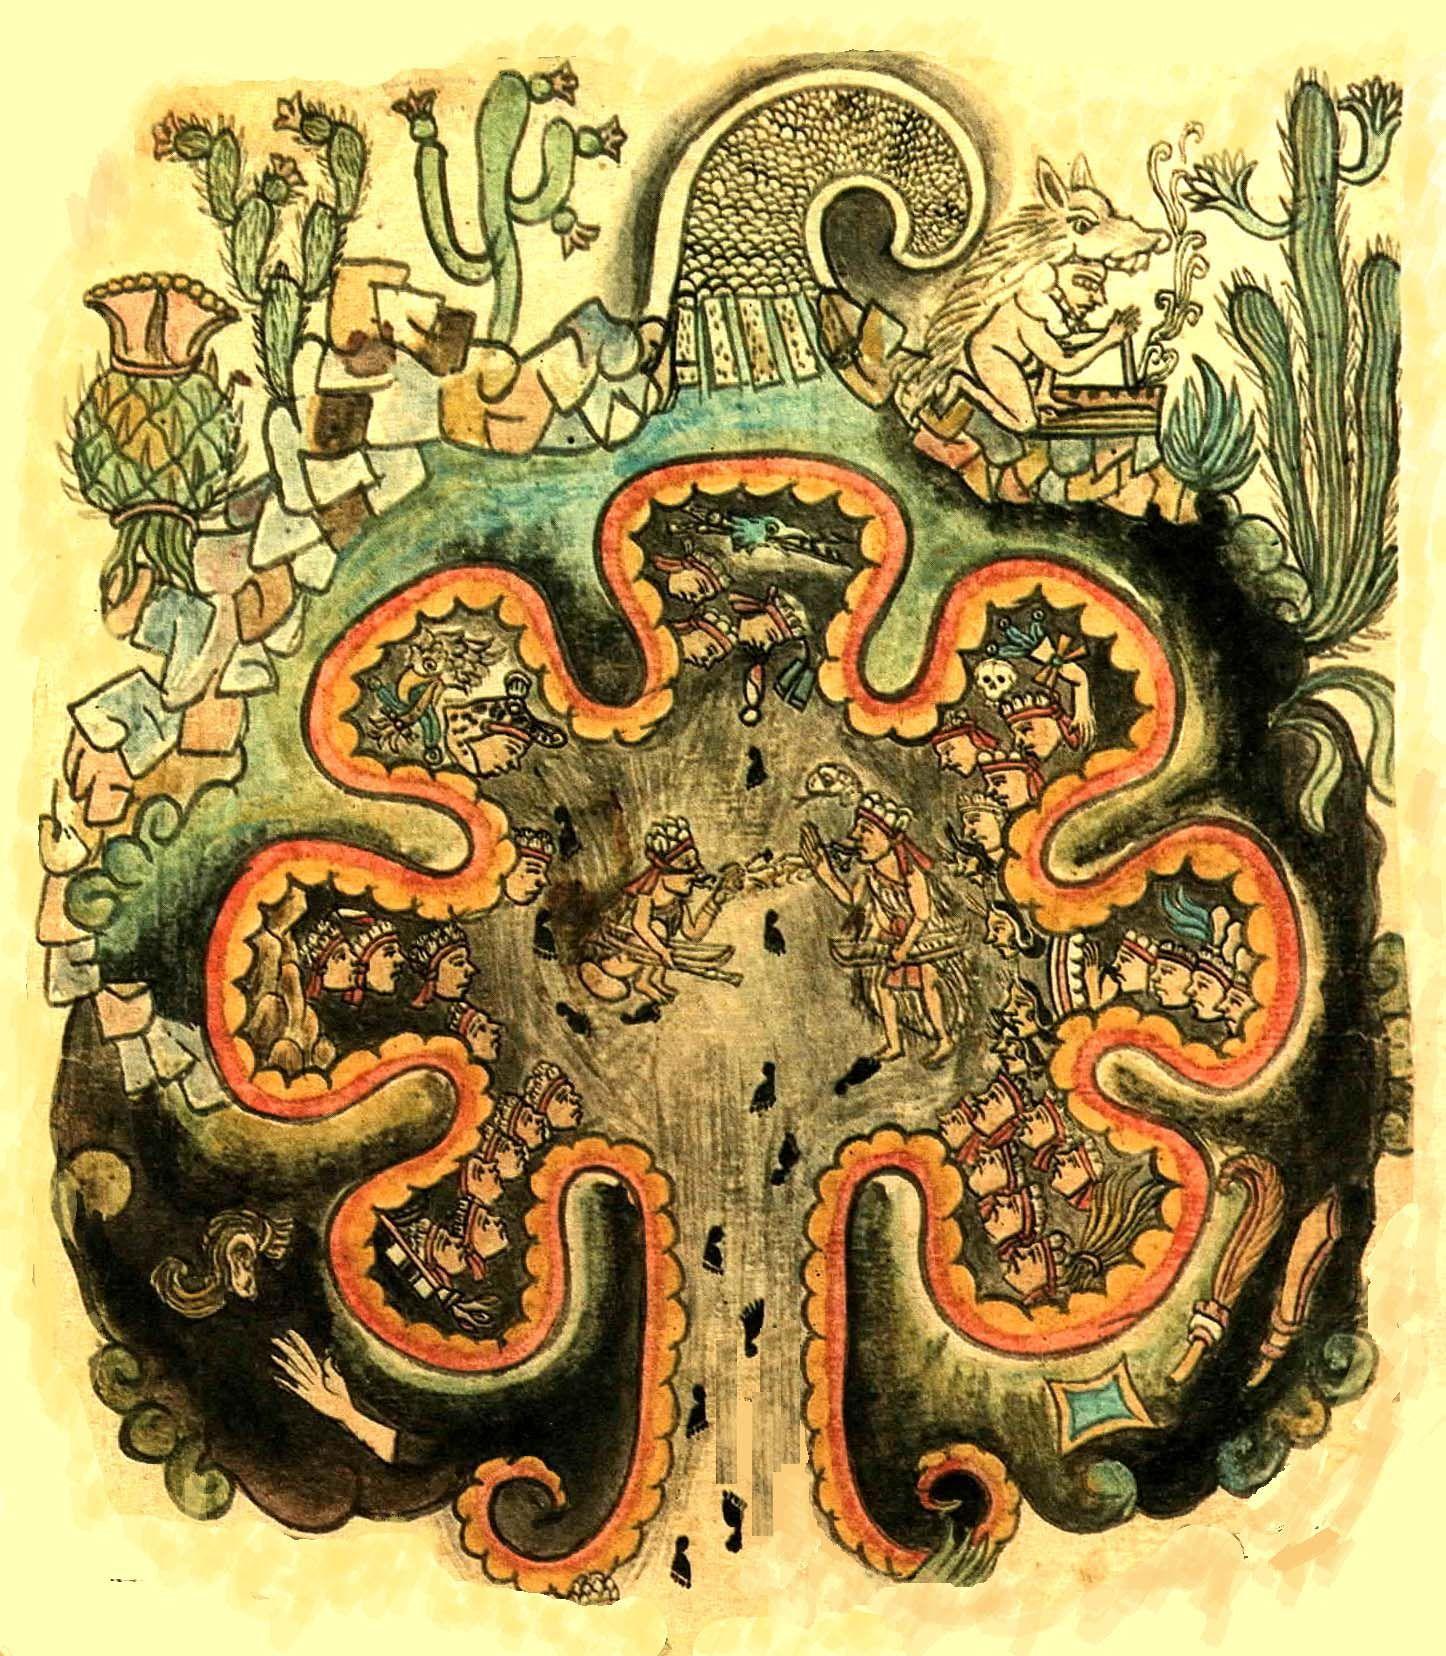 Image - The Historia Tolteca-Chichimeca